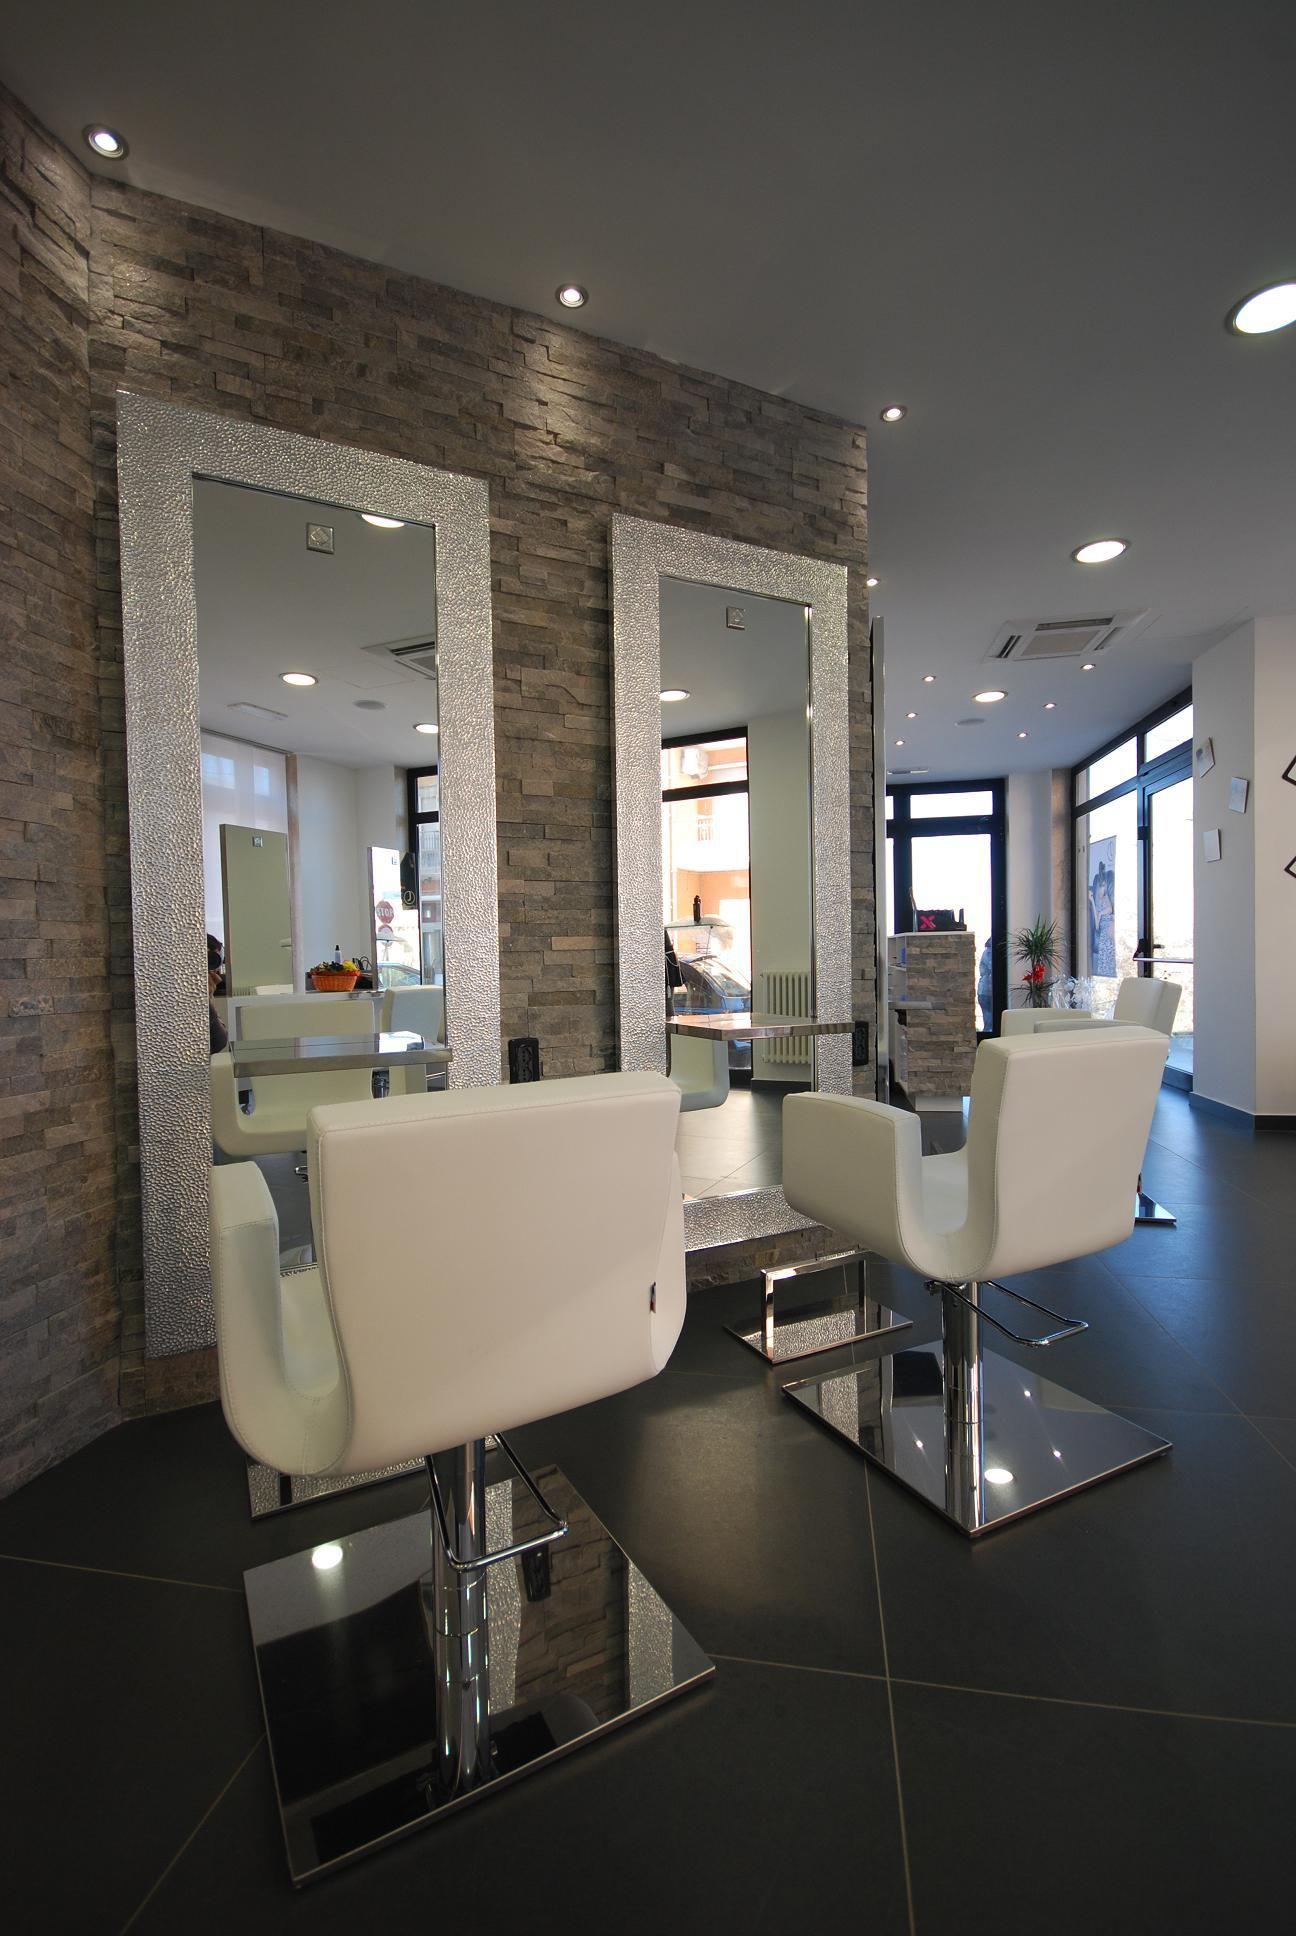 Hair Salon Apps for Android  Spa inspiration  Hair salon interior Home hair salons Beauty